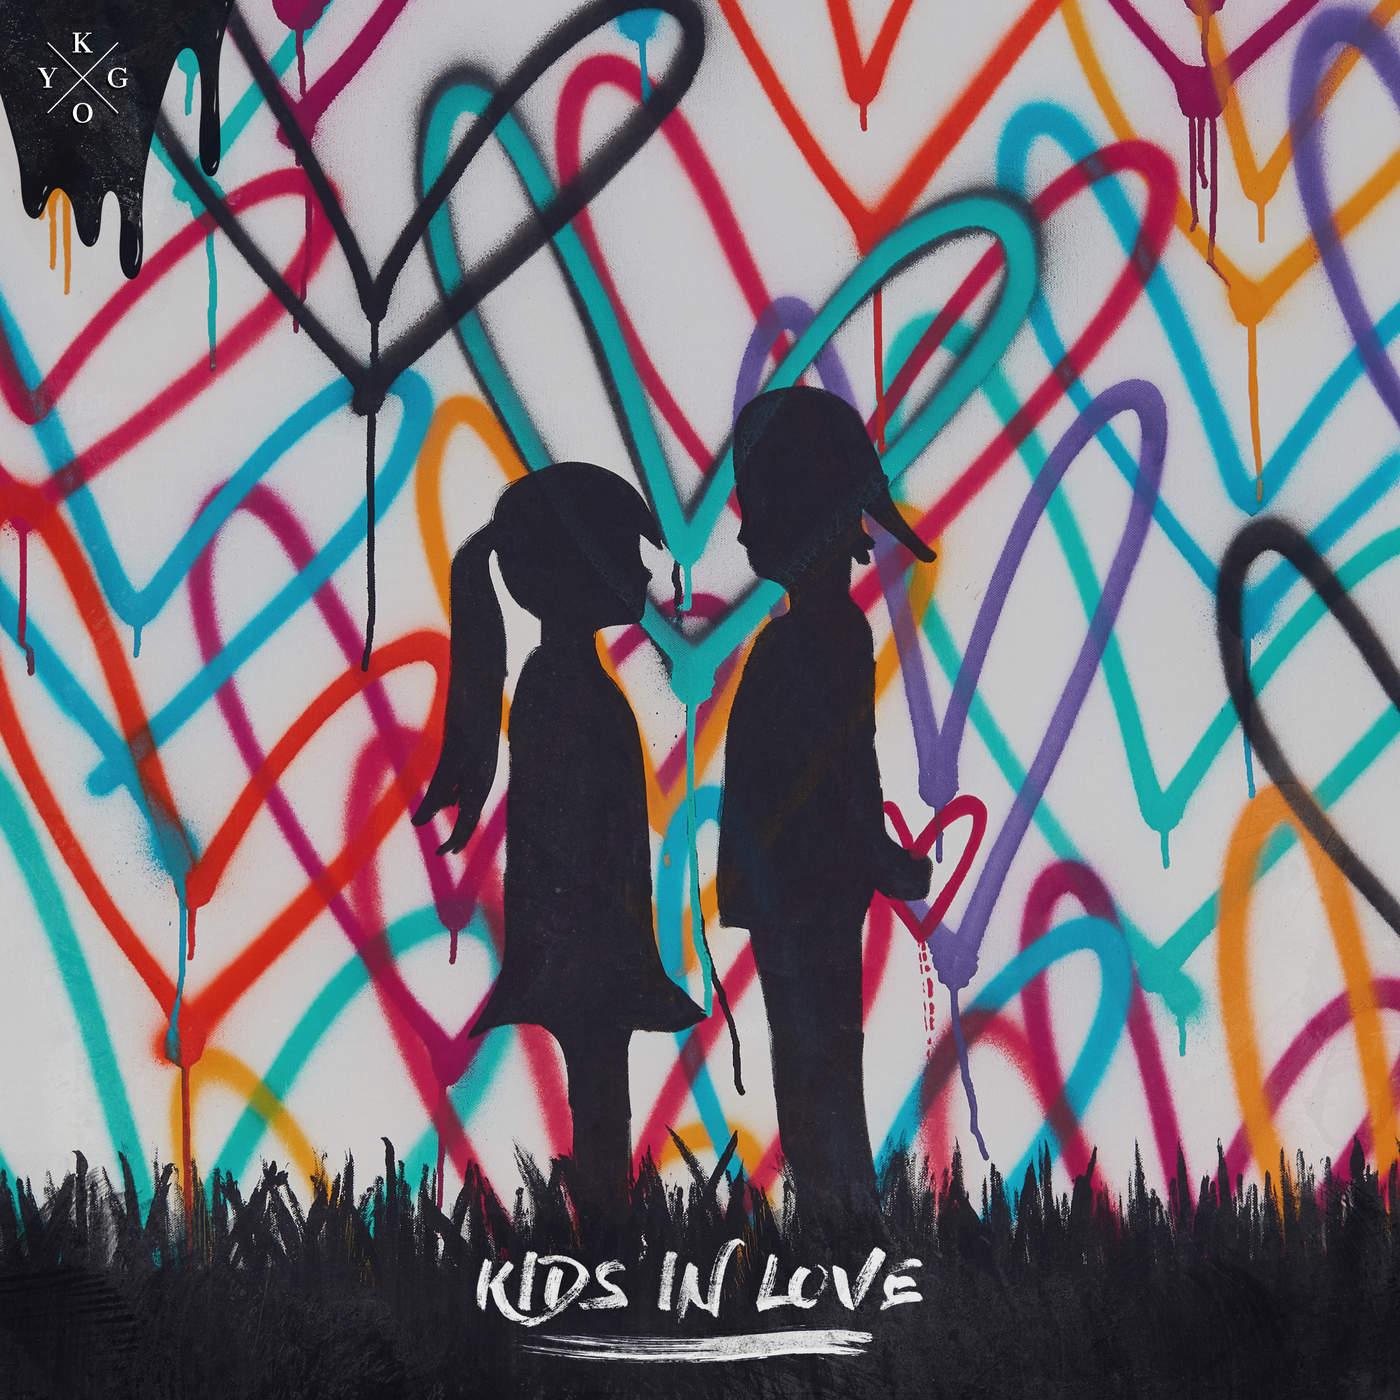 Kygo - Kids in Love (feat. The Night Game & Maja Francis) - Single